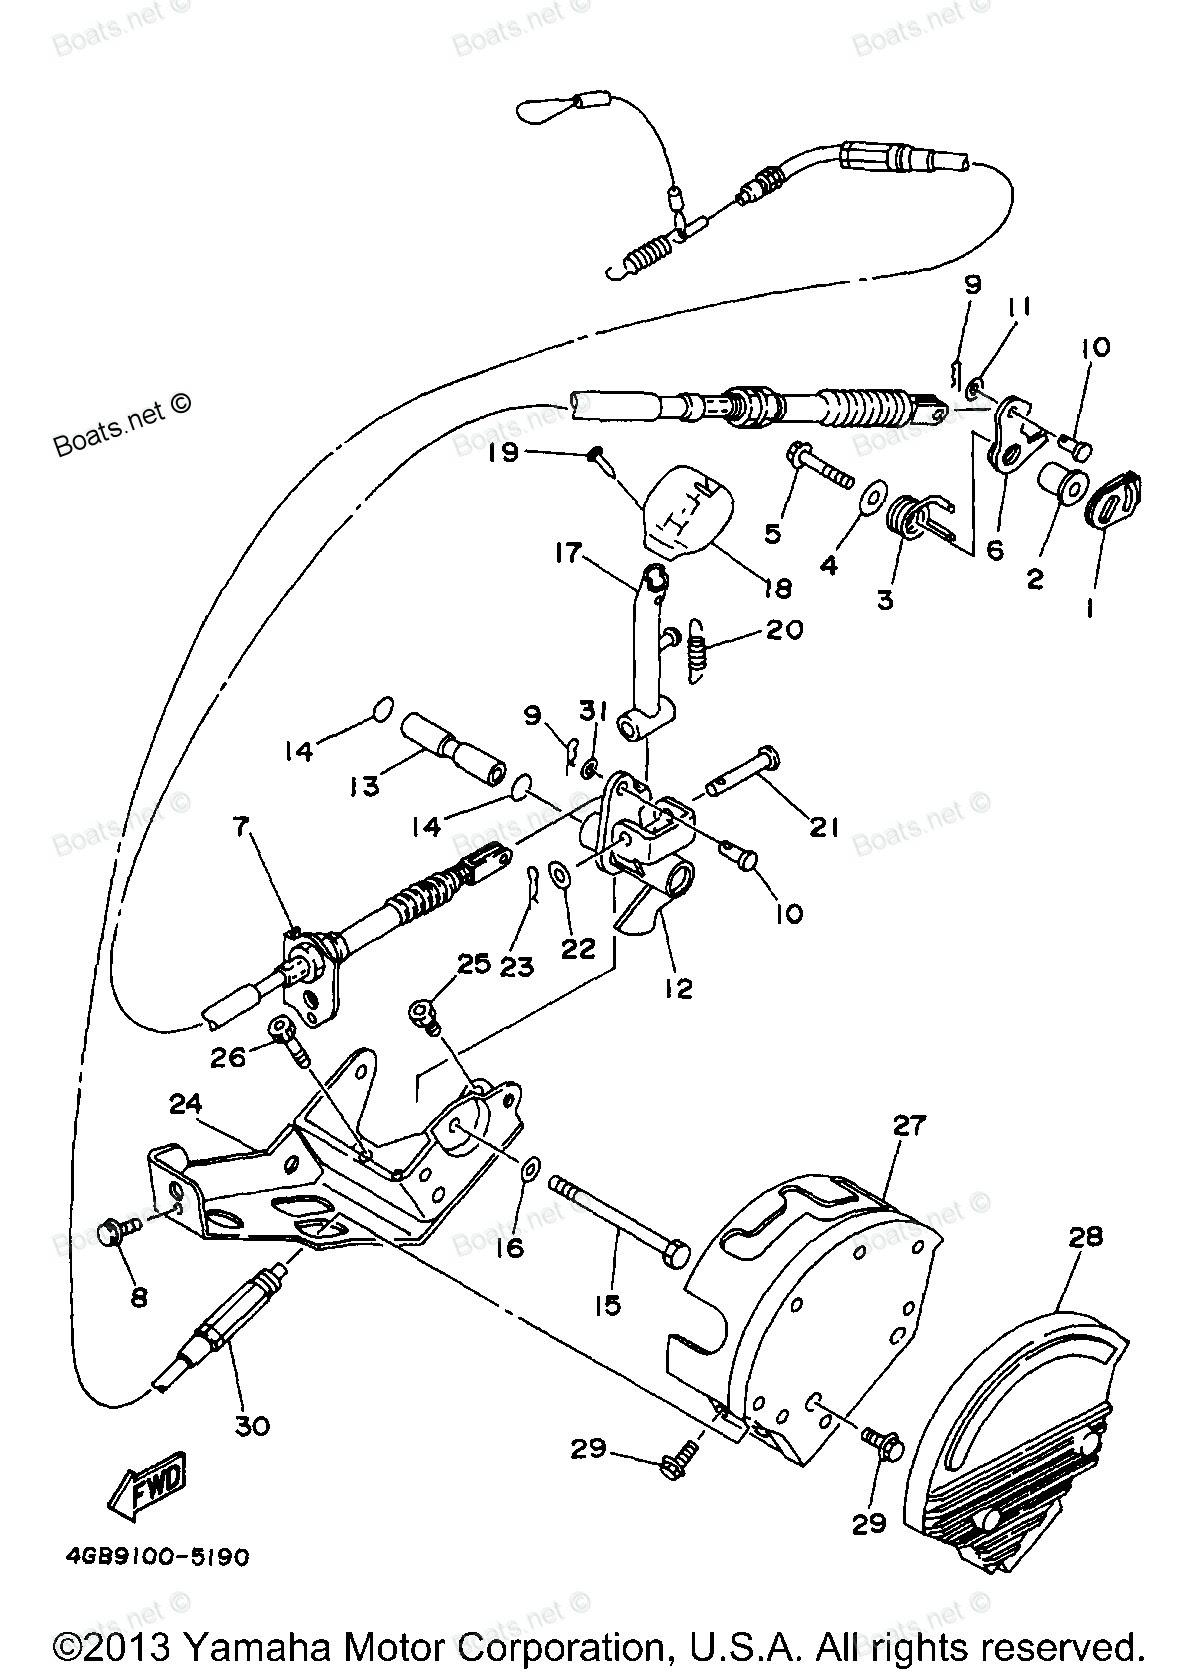 Wiring Diagram Gallery: Gibson Les Paul 50s Wiring Diagram